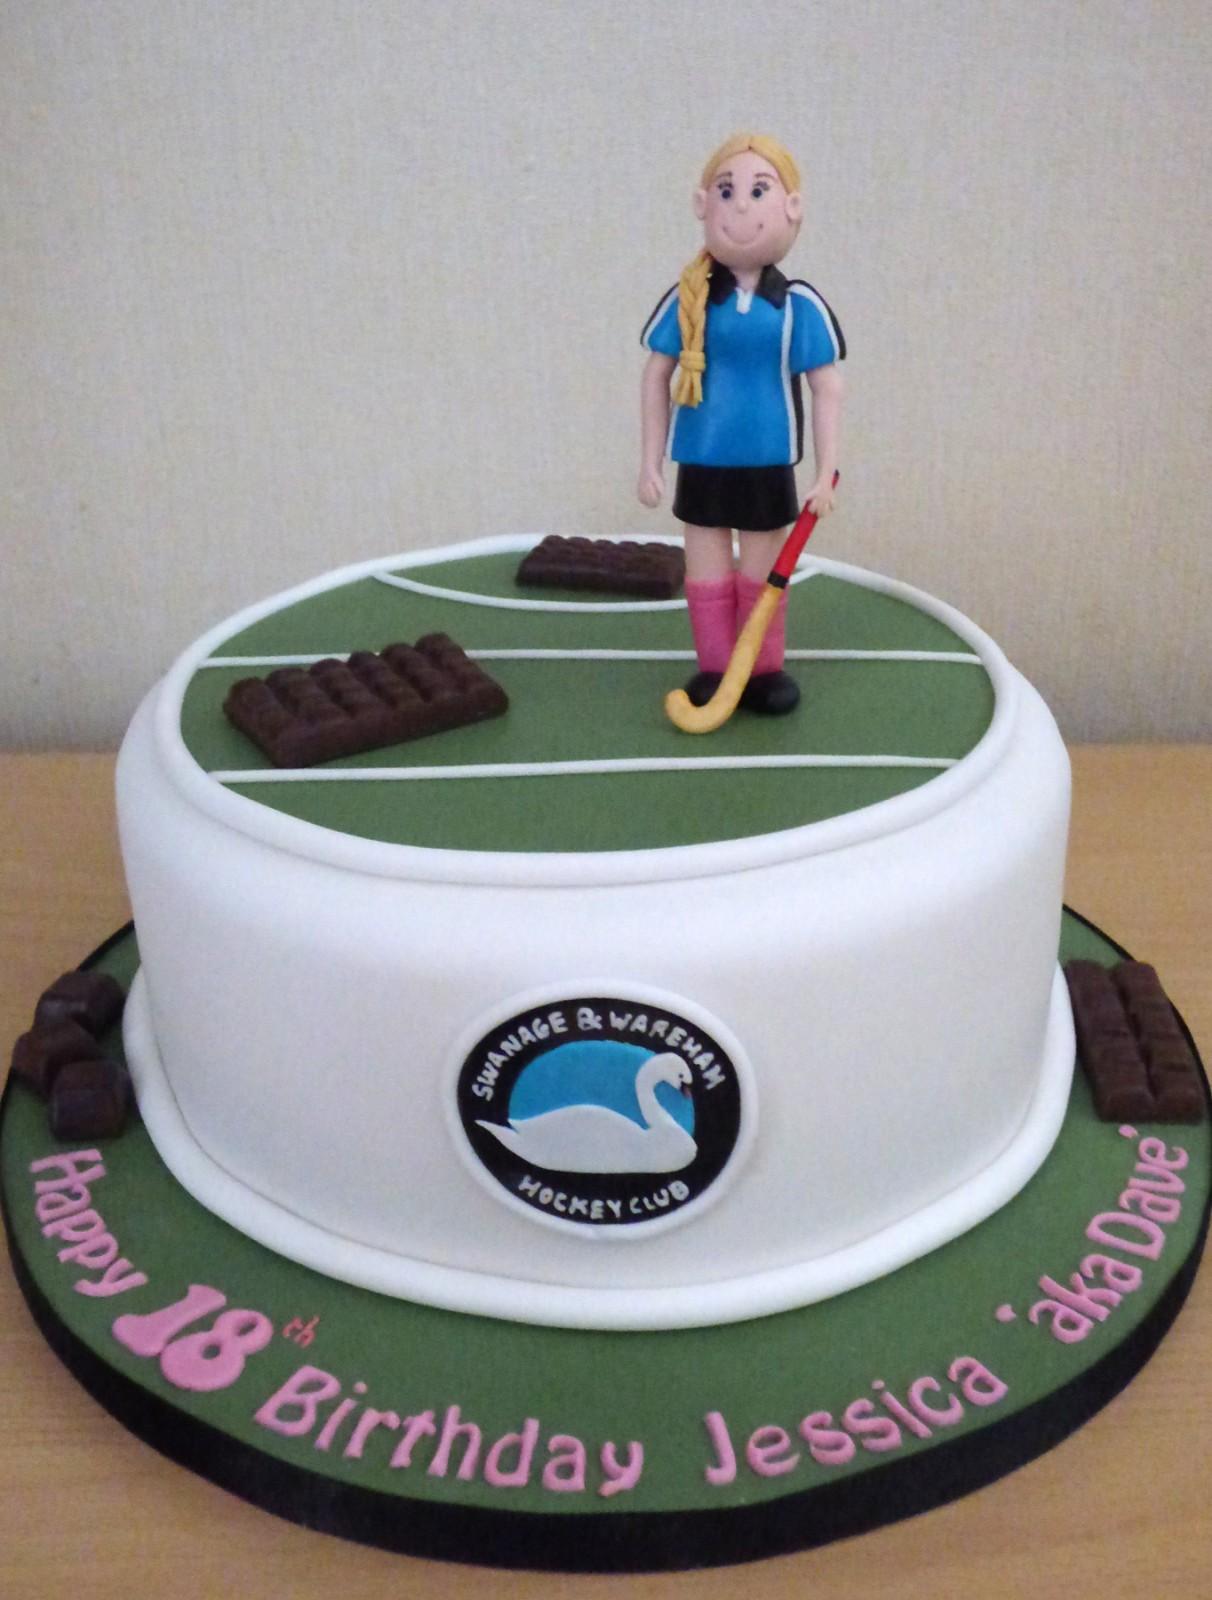 Amazing Wareham And Swanage Hockey Club Birthday Cake Susies Cakes Personalised Birthday Cards Petedlily Jamesorg